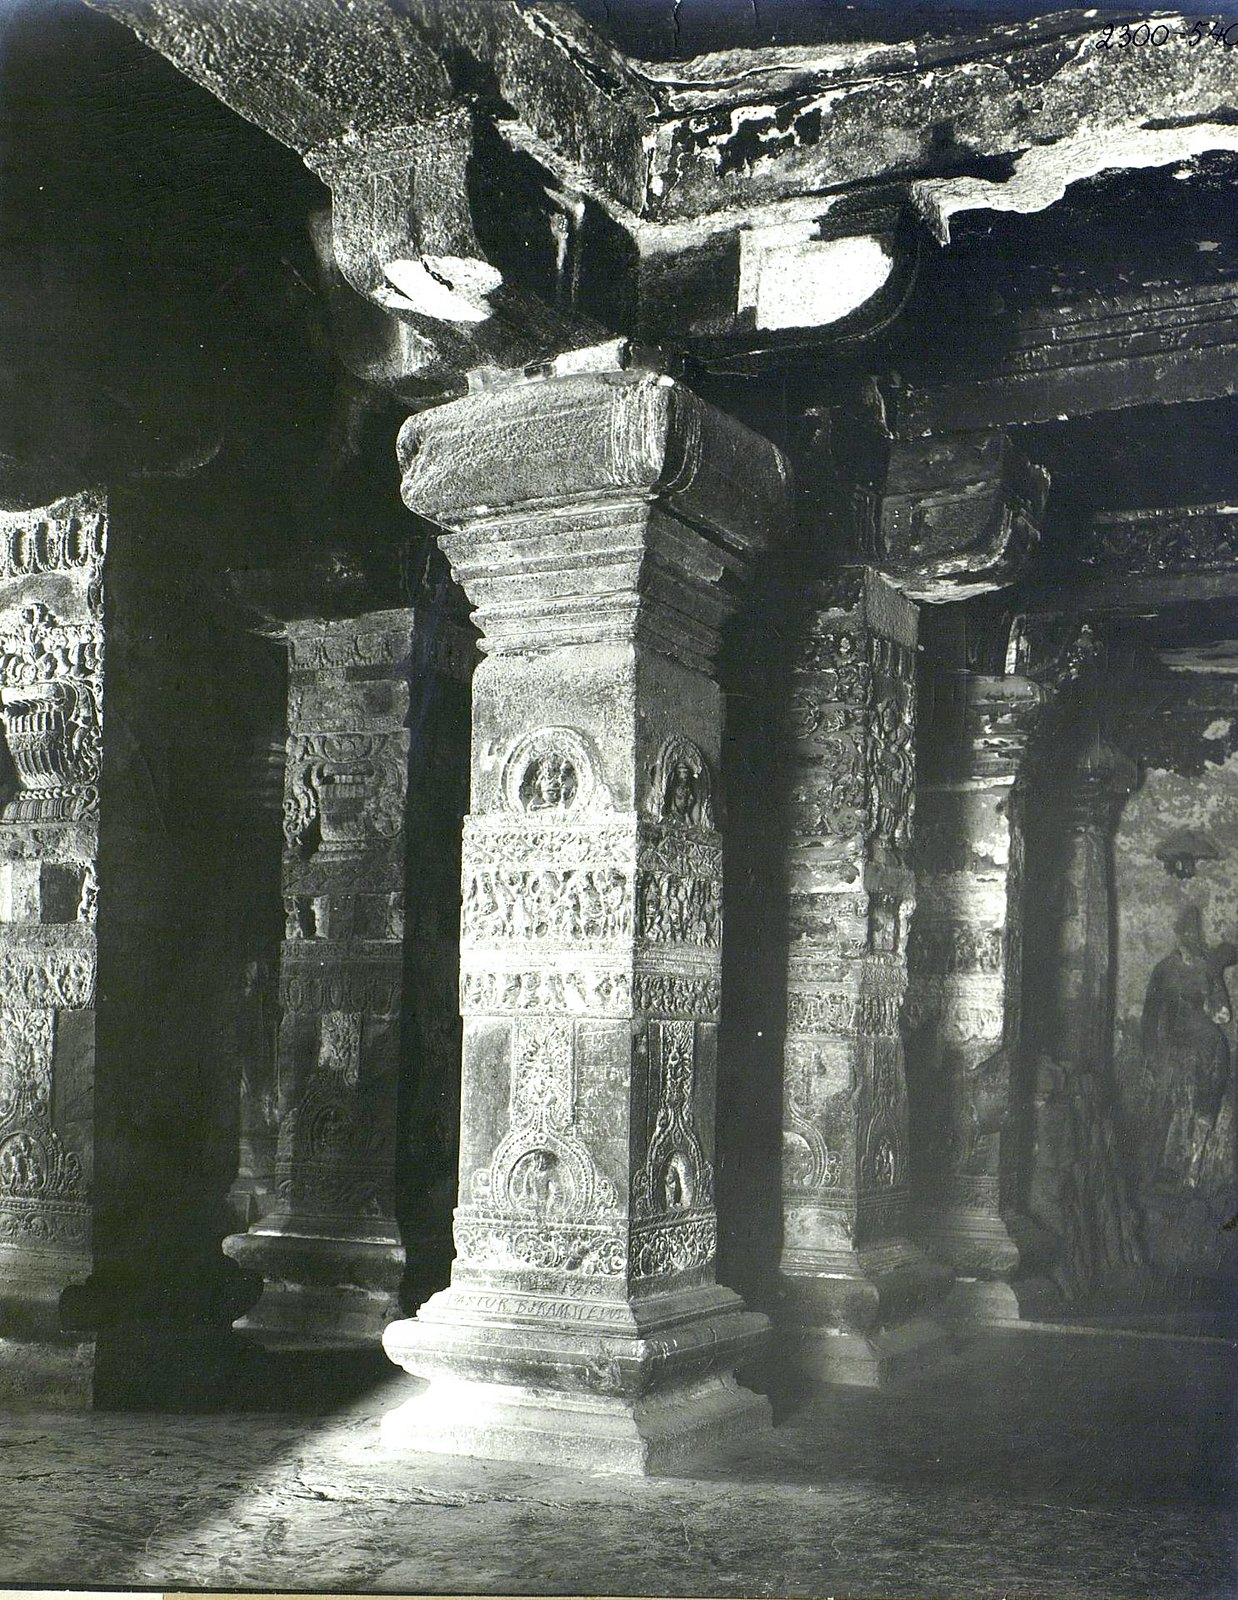 Храм Кайласа в Эллоре (детали входа) (6)